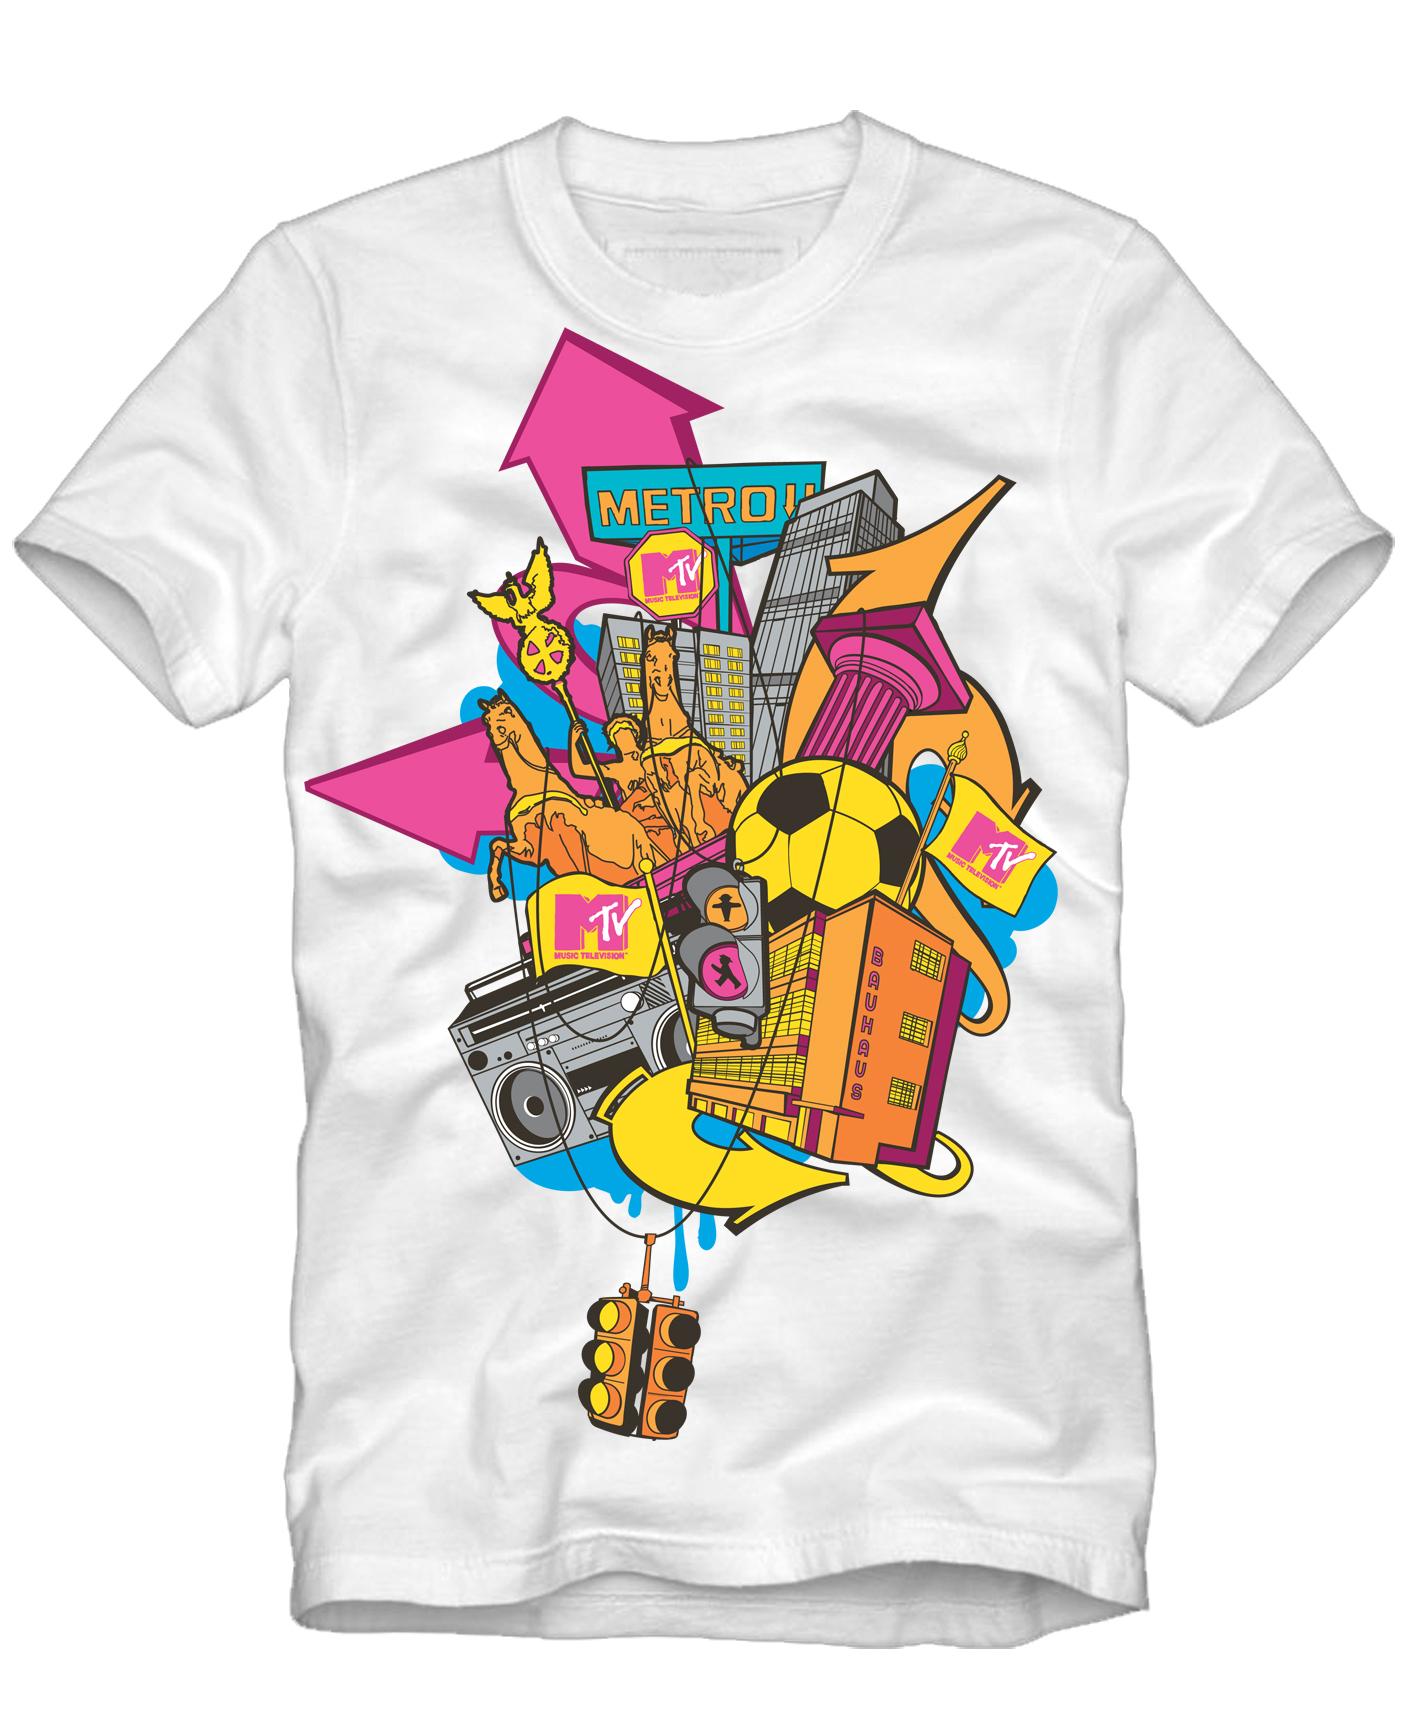 MTV x Zara T-shirt 3